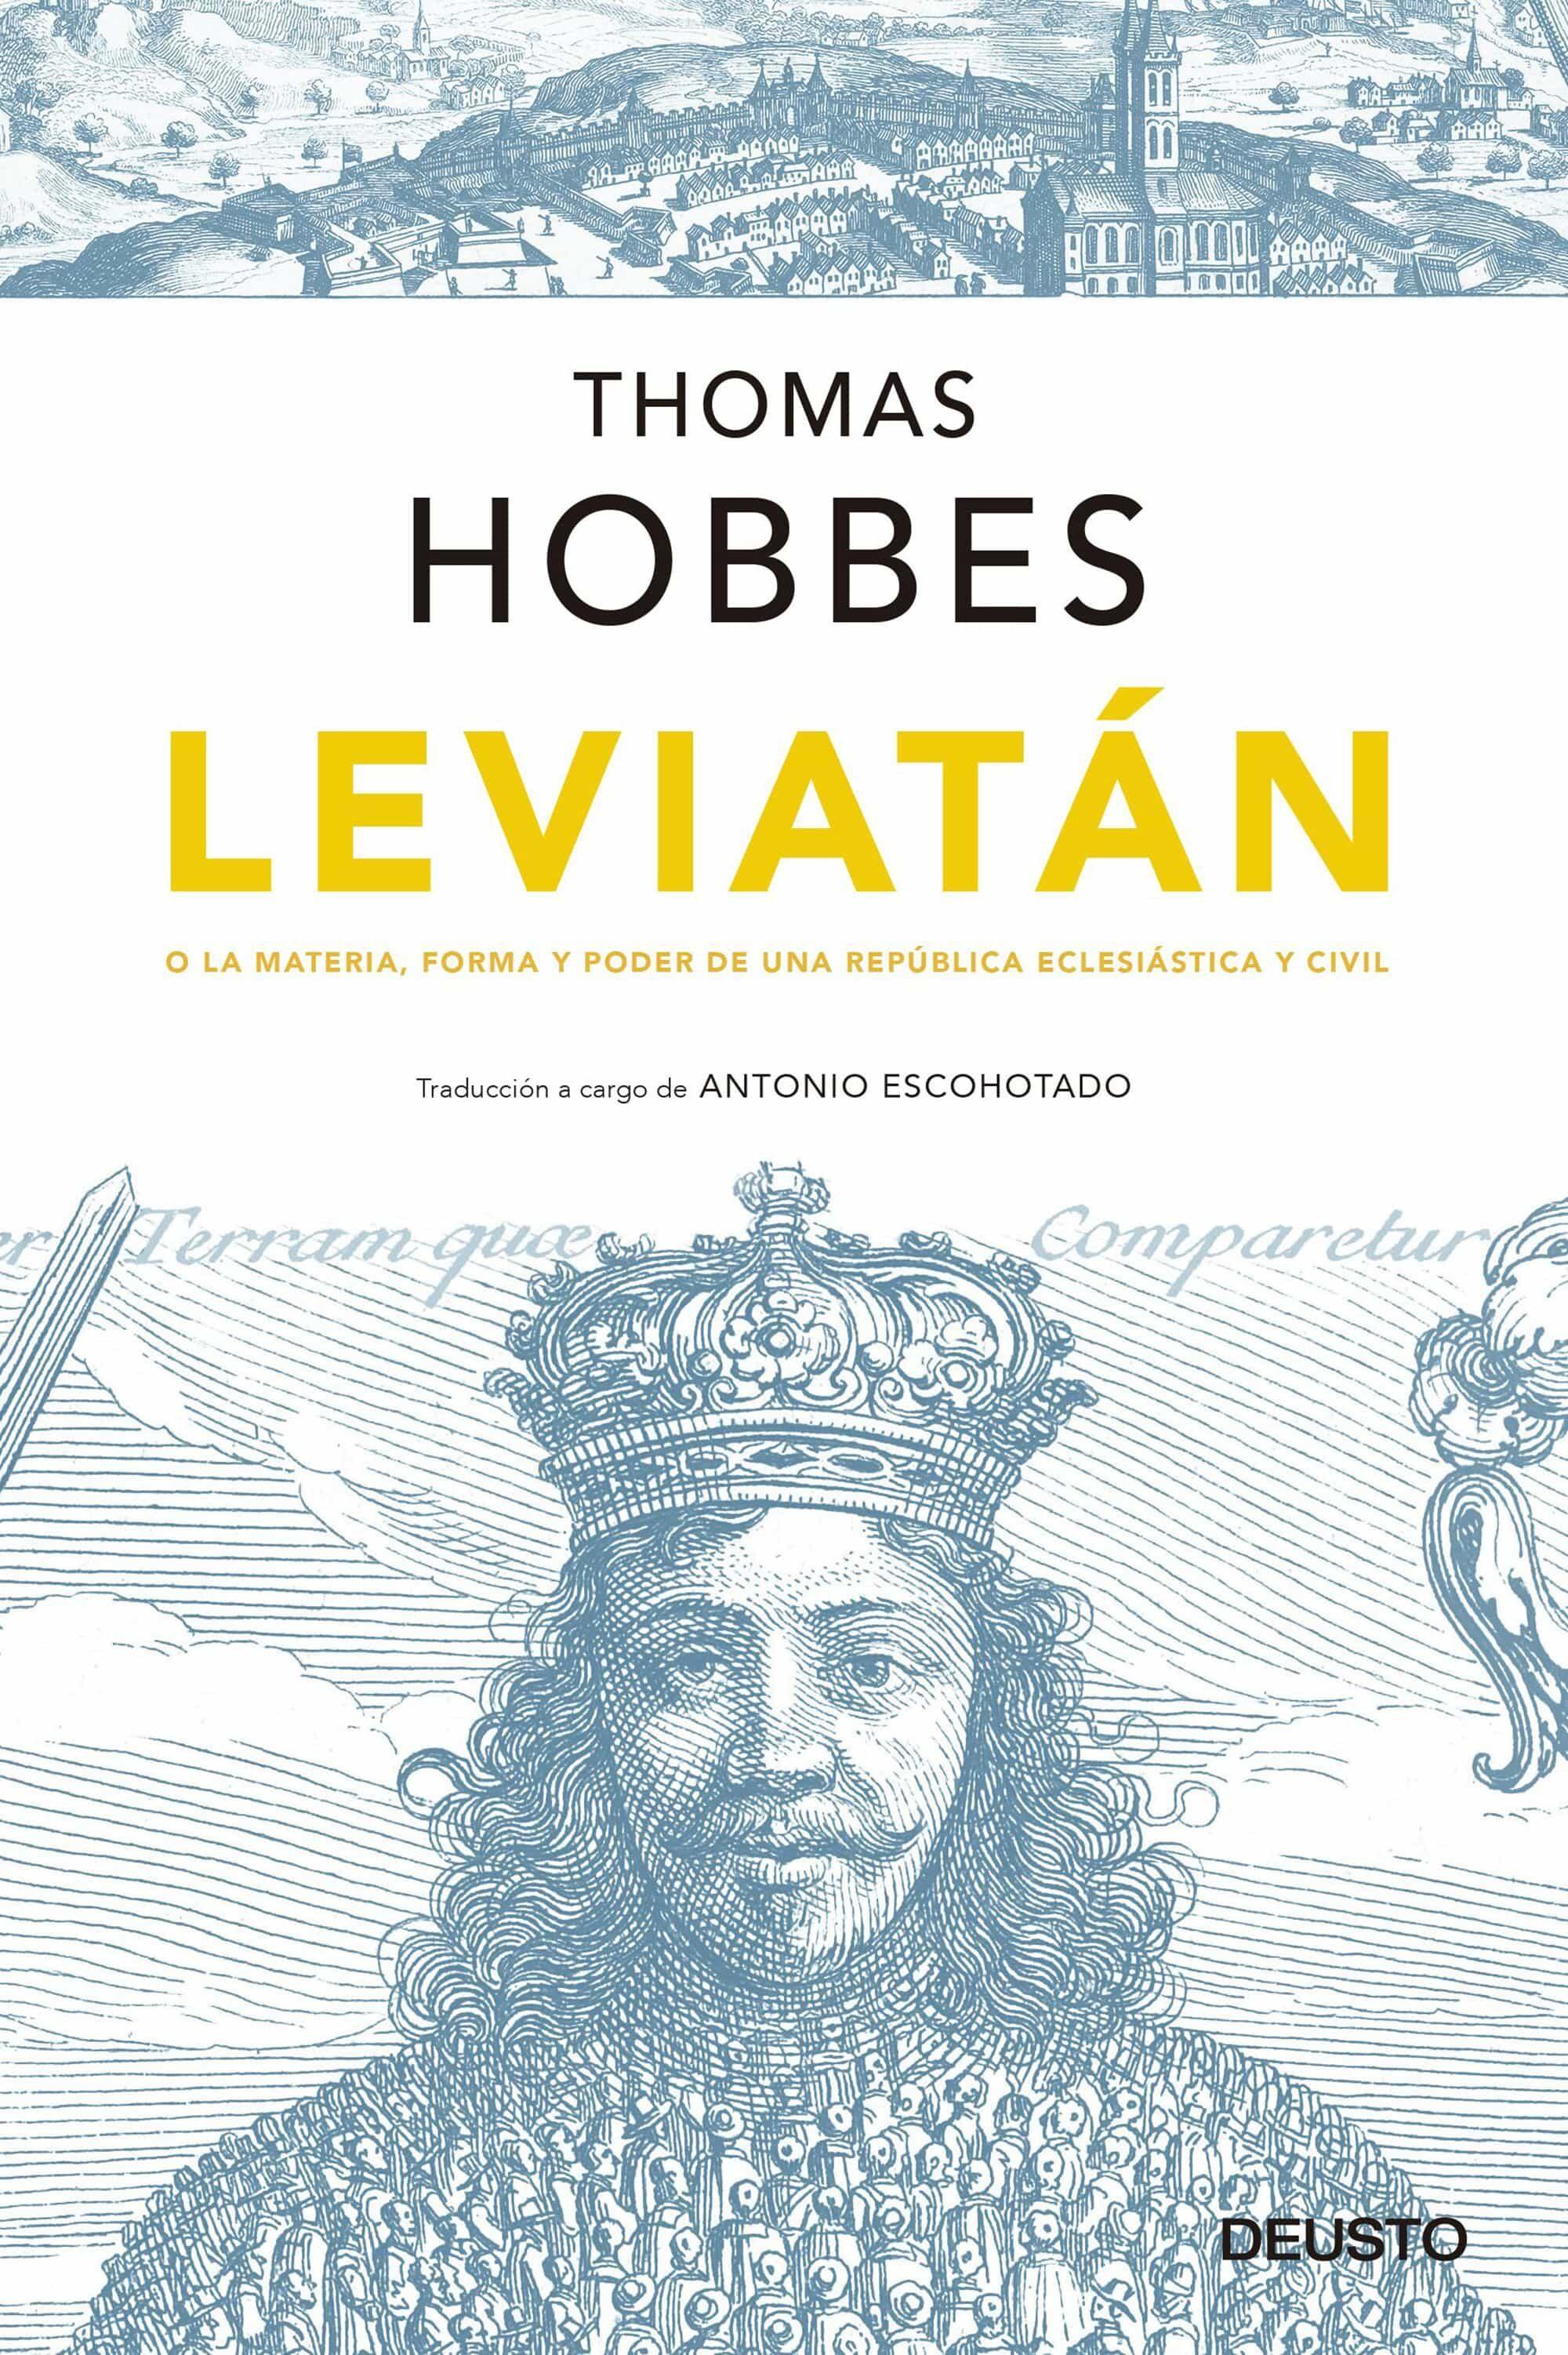 leviatan-thomas hobbes-9788423429684